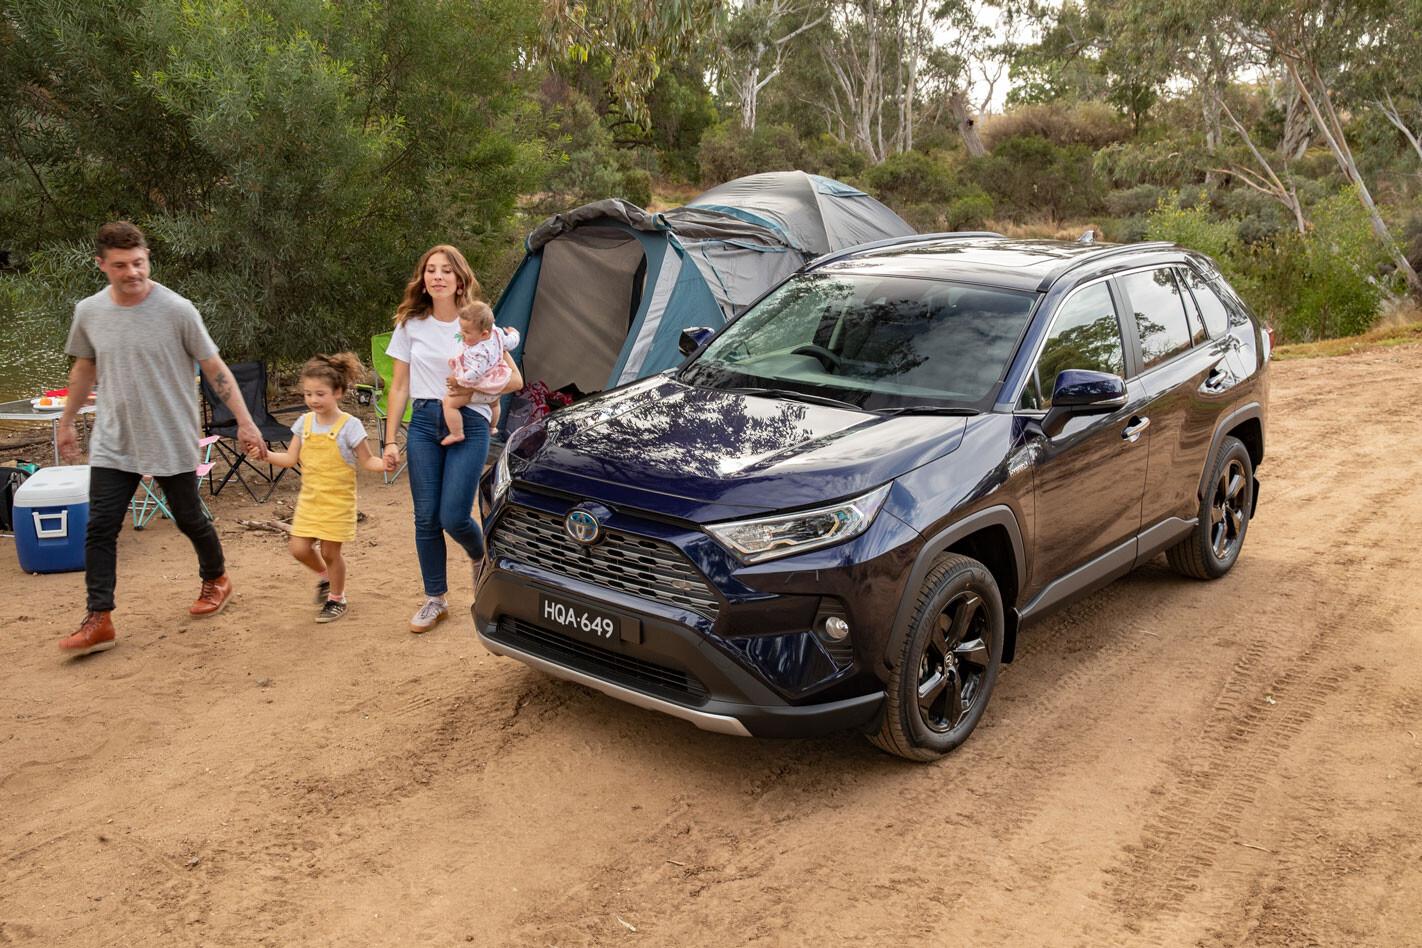 Toyota RAV4 camping trip